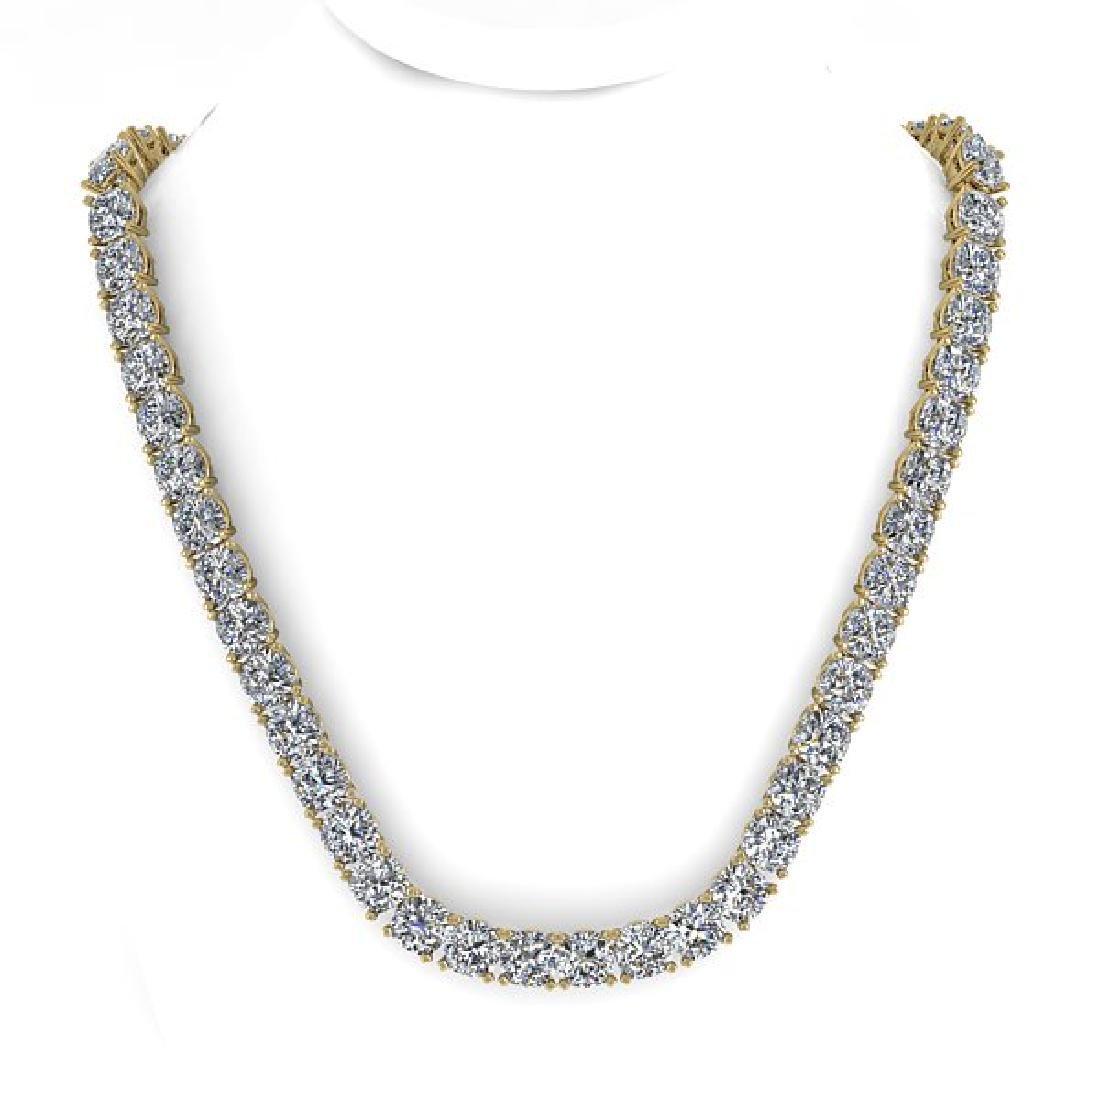 35 CTW Cushion Cut Certified SI Diamond Necklace 18K - 3